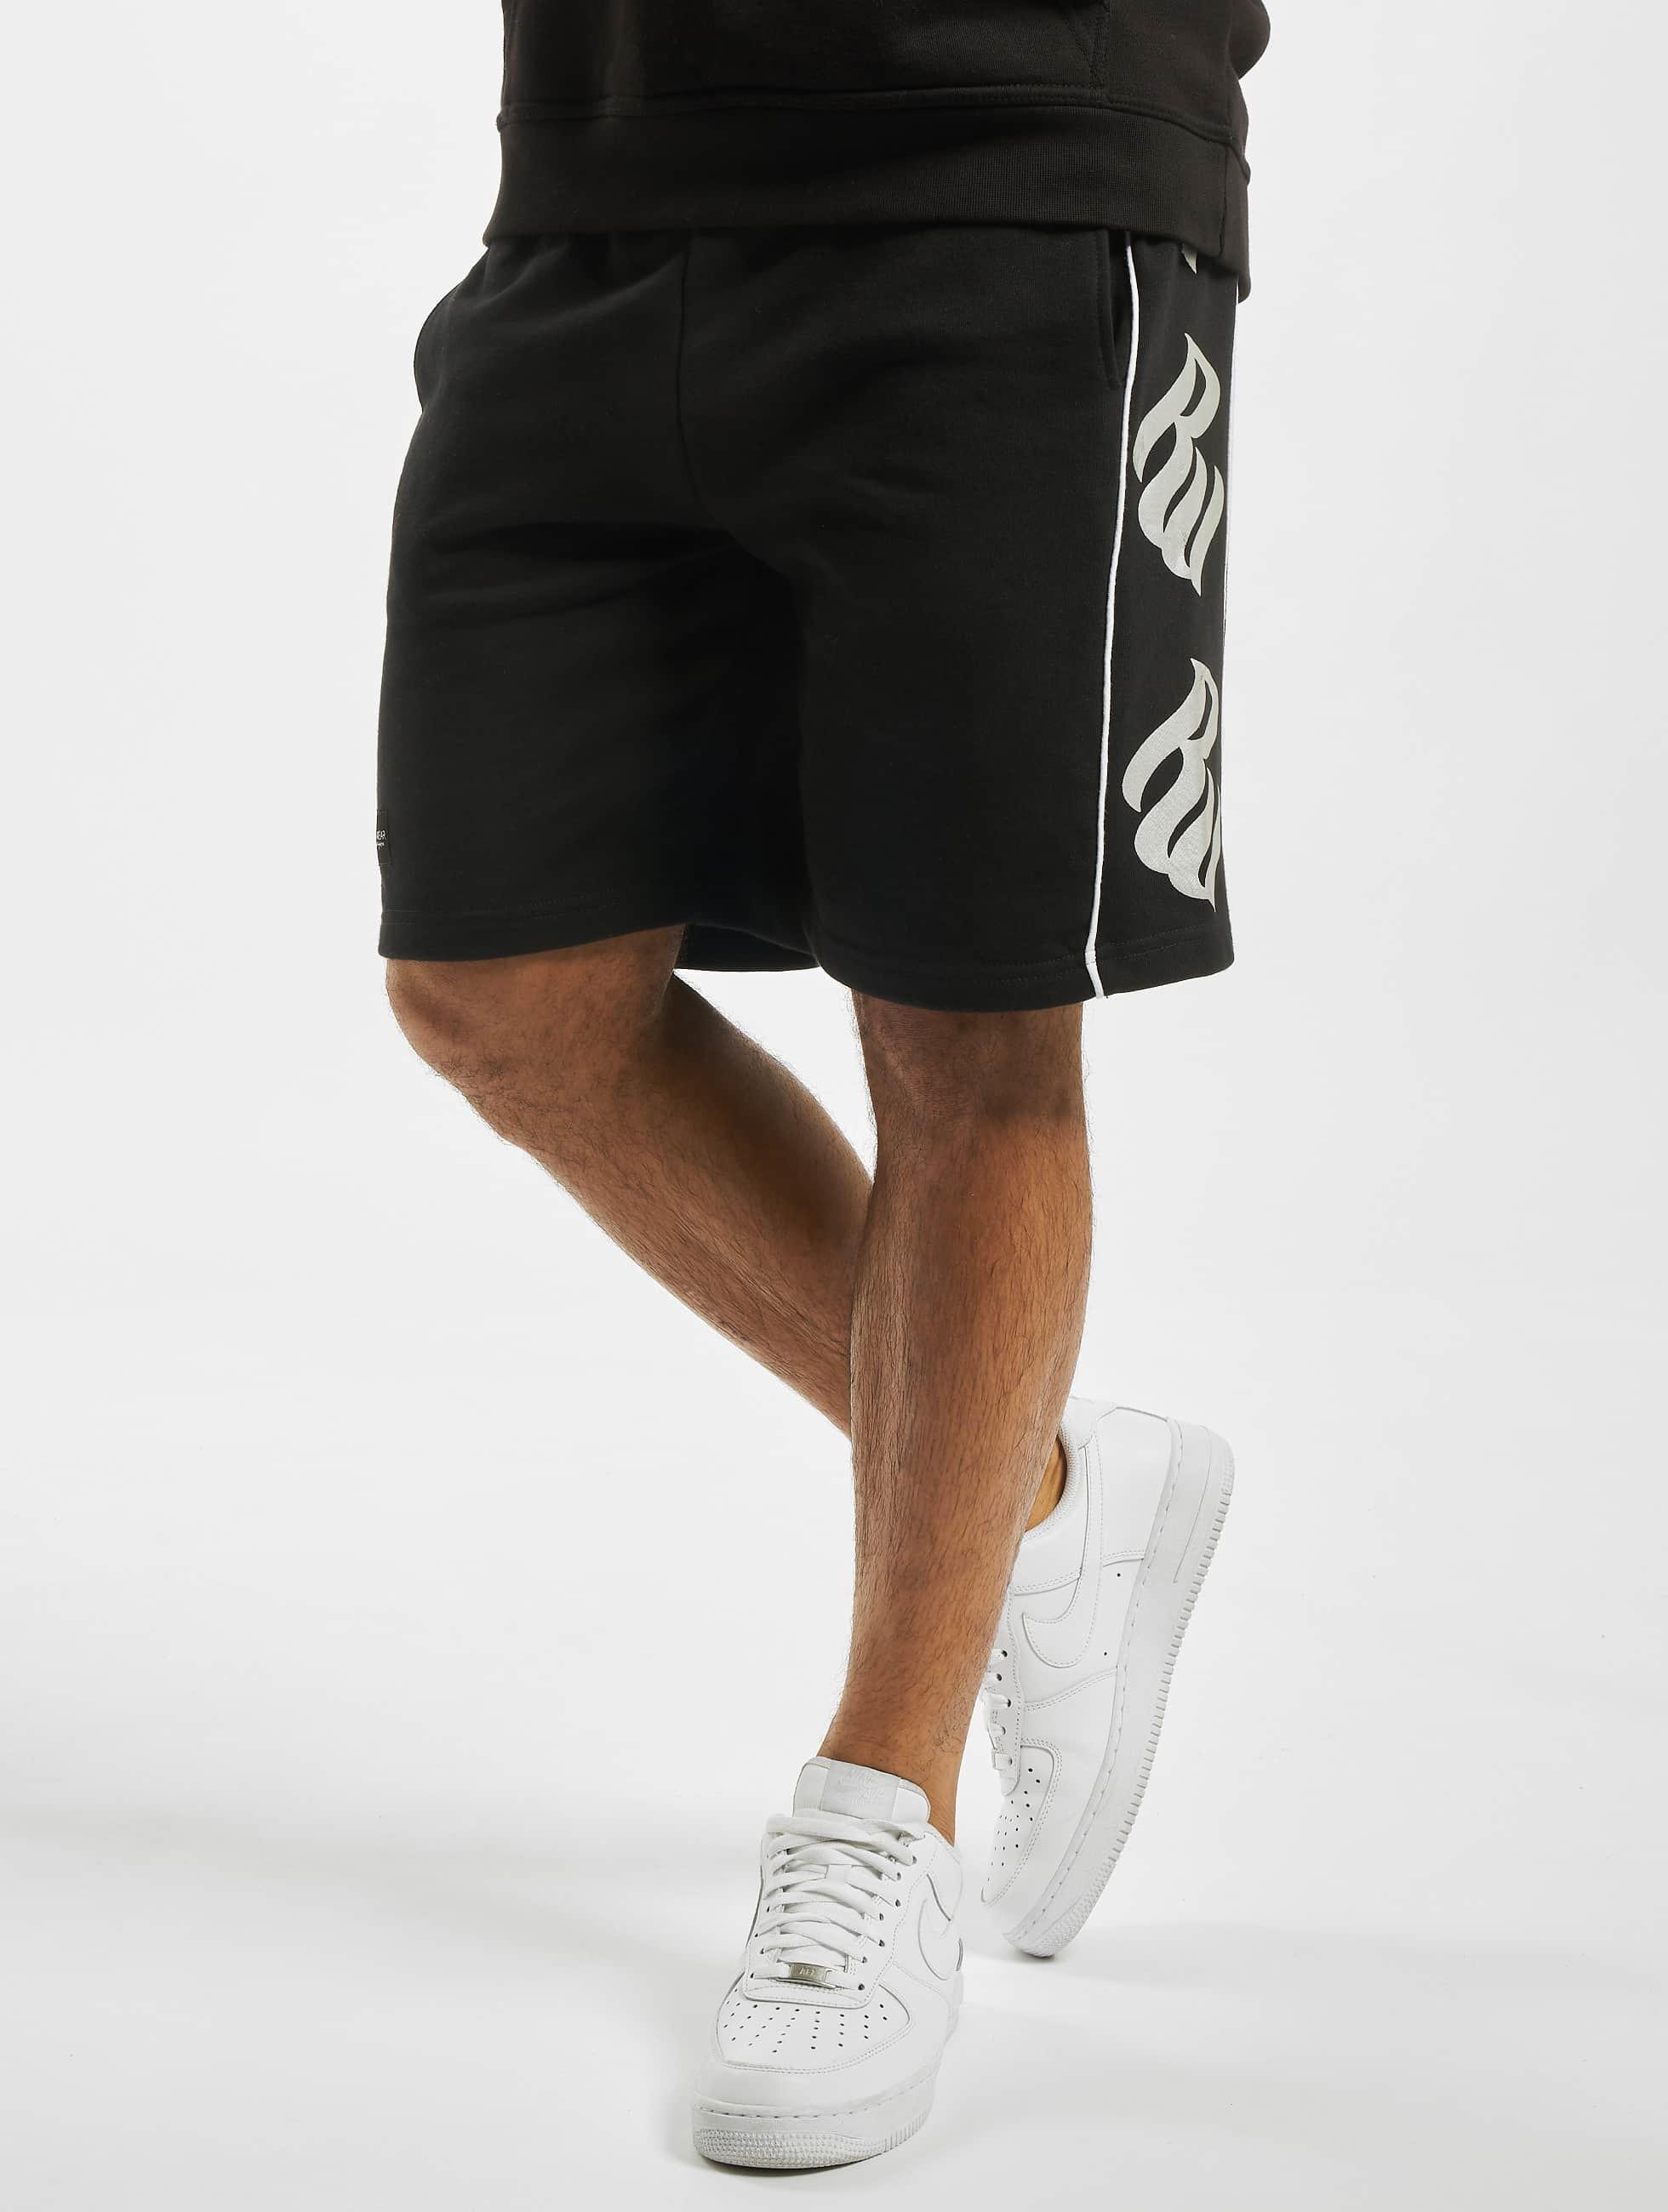 Rocawear / Short Hudson in black S